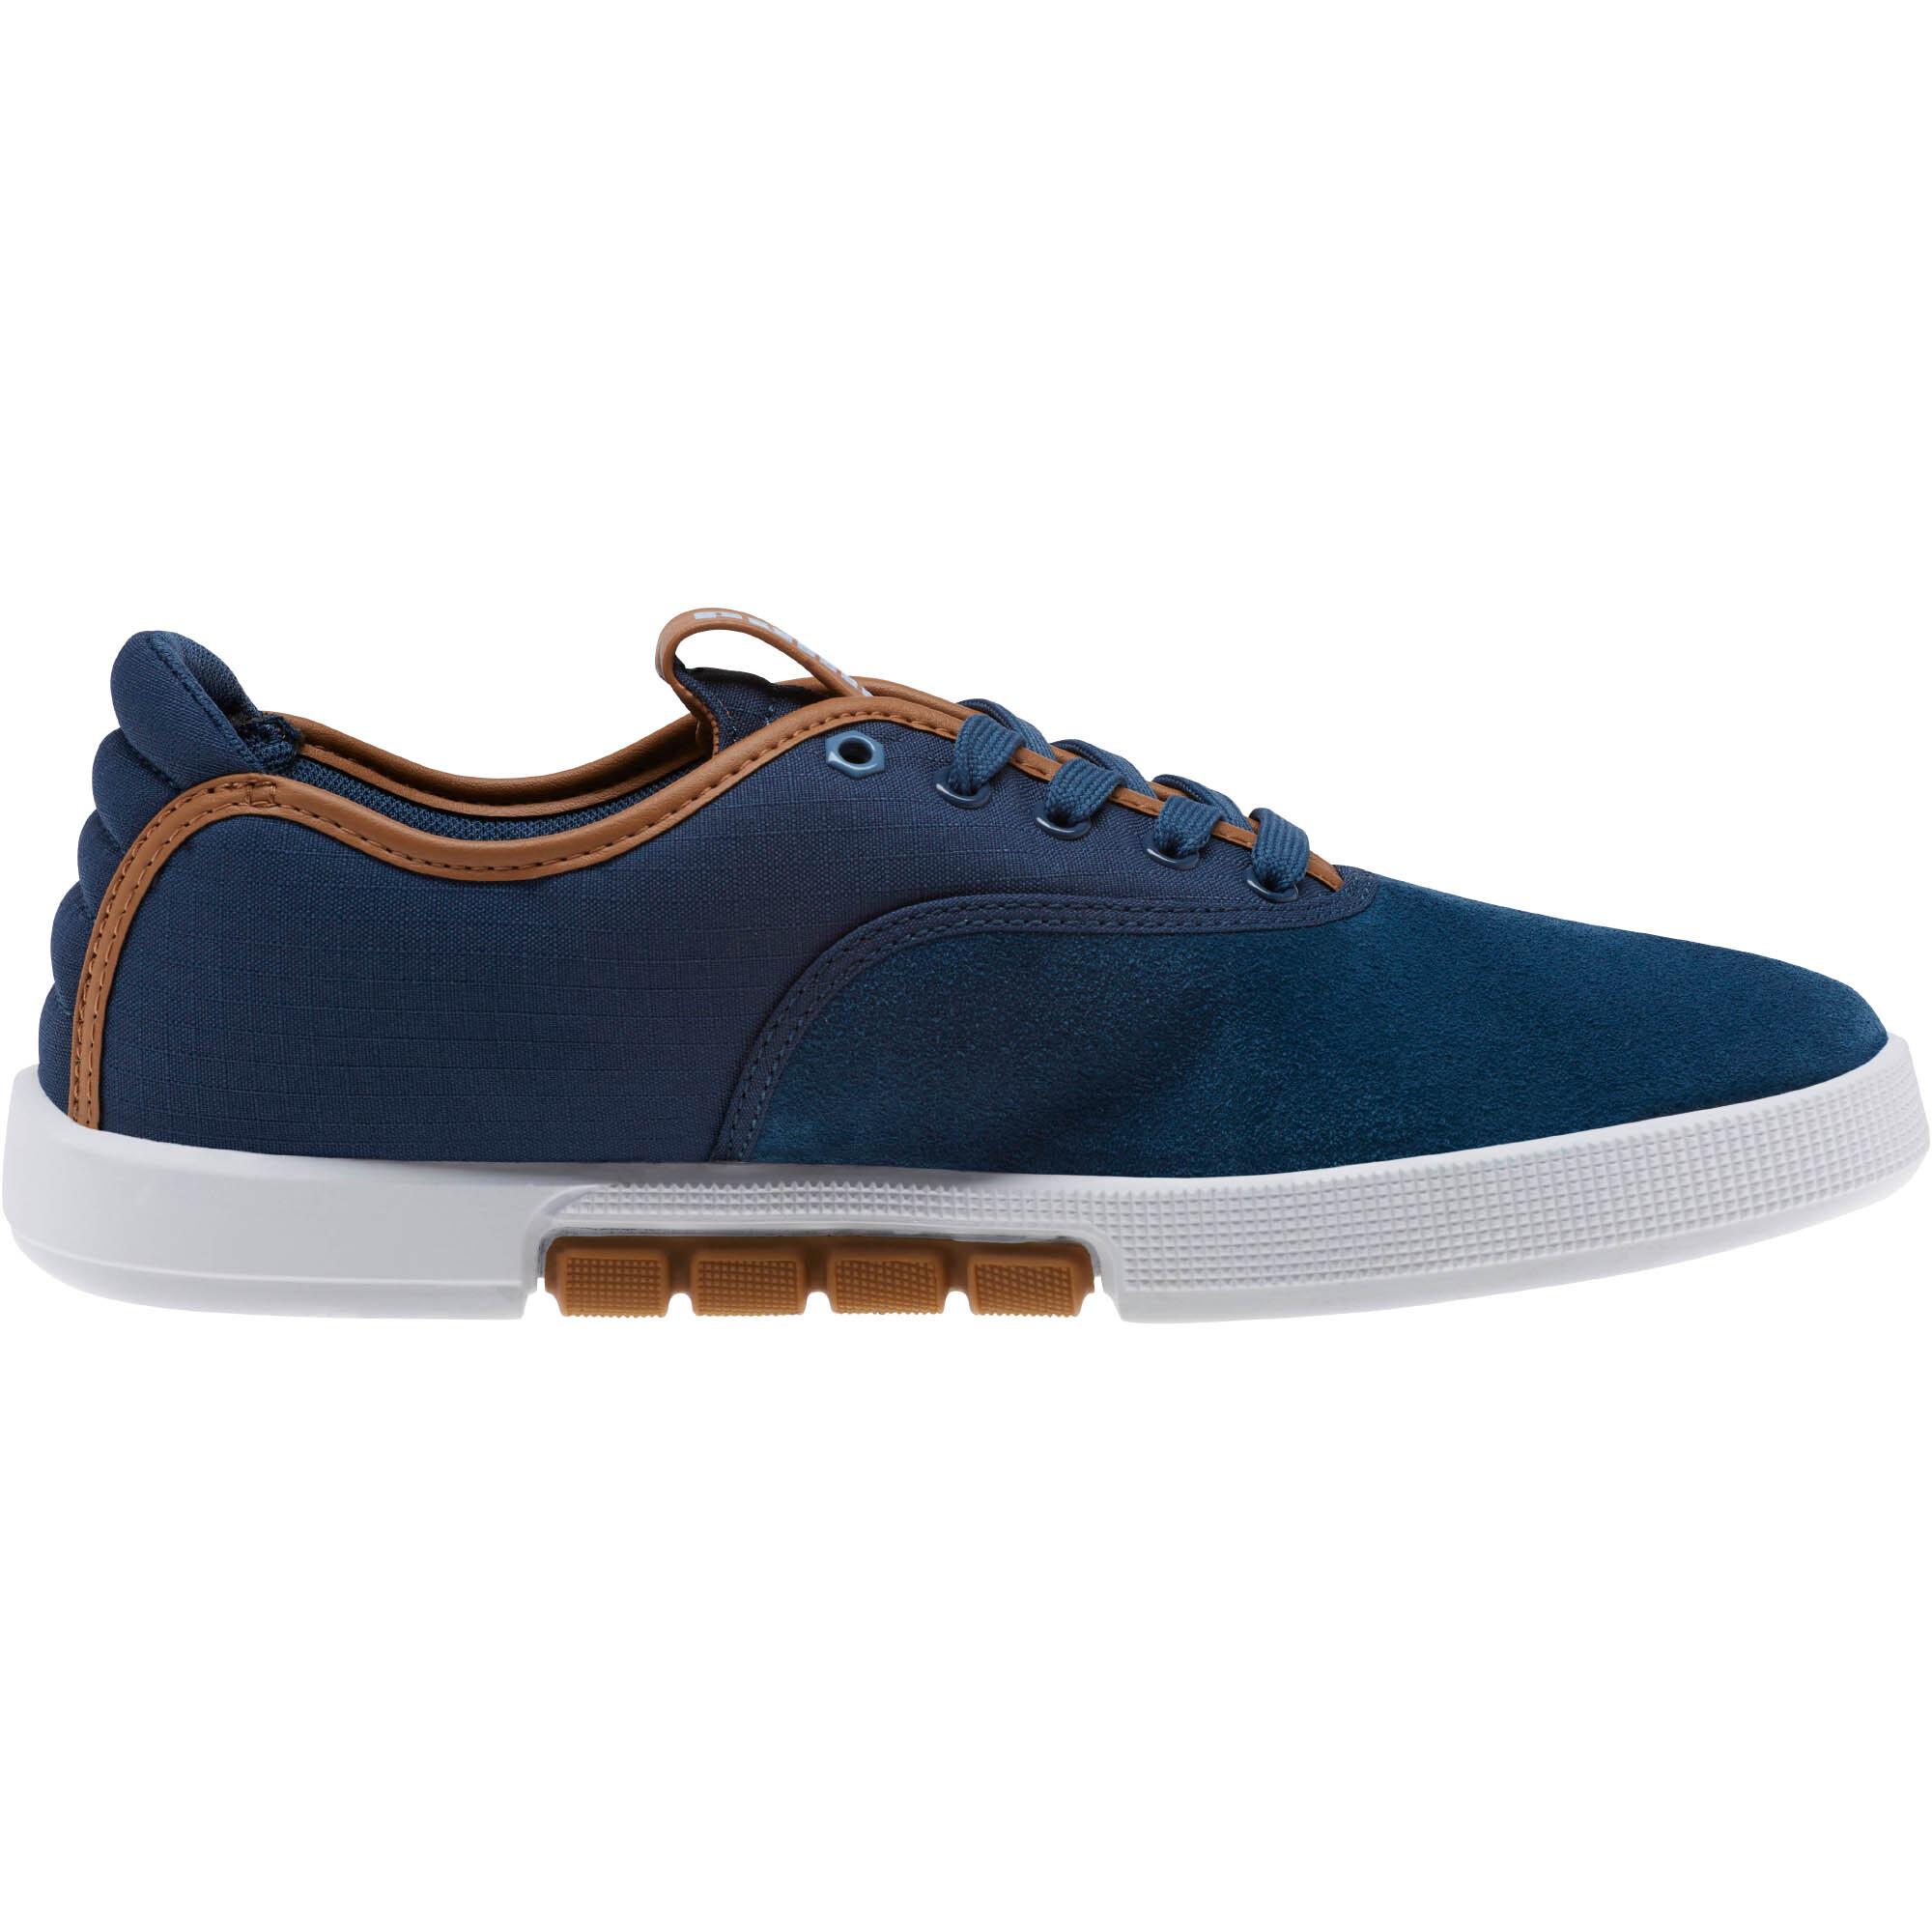 PUMA-Funist-Lo-MU-Men-039-s-Sneakers-Men-Shoe-Evolution thumbnail 13